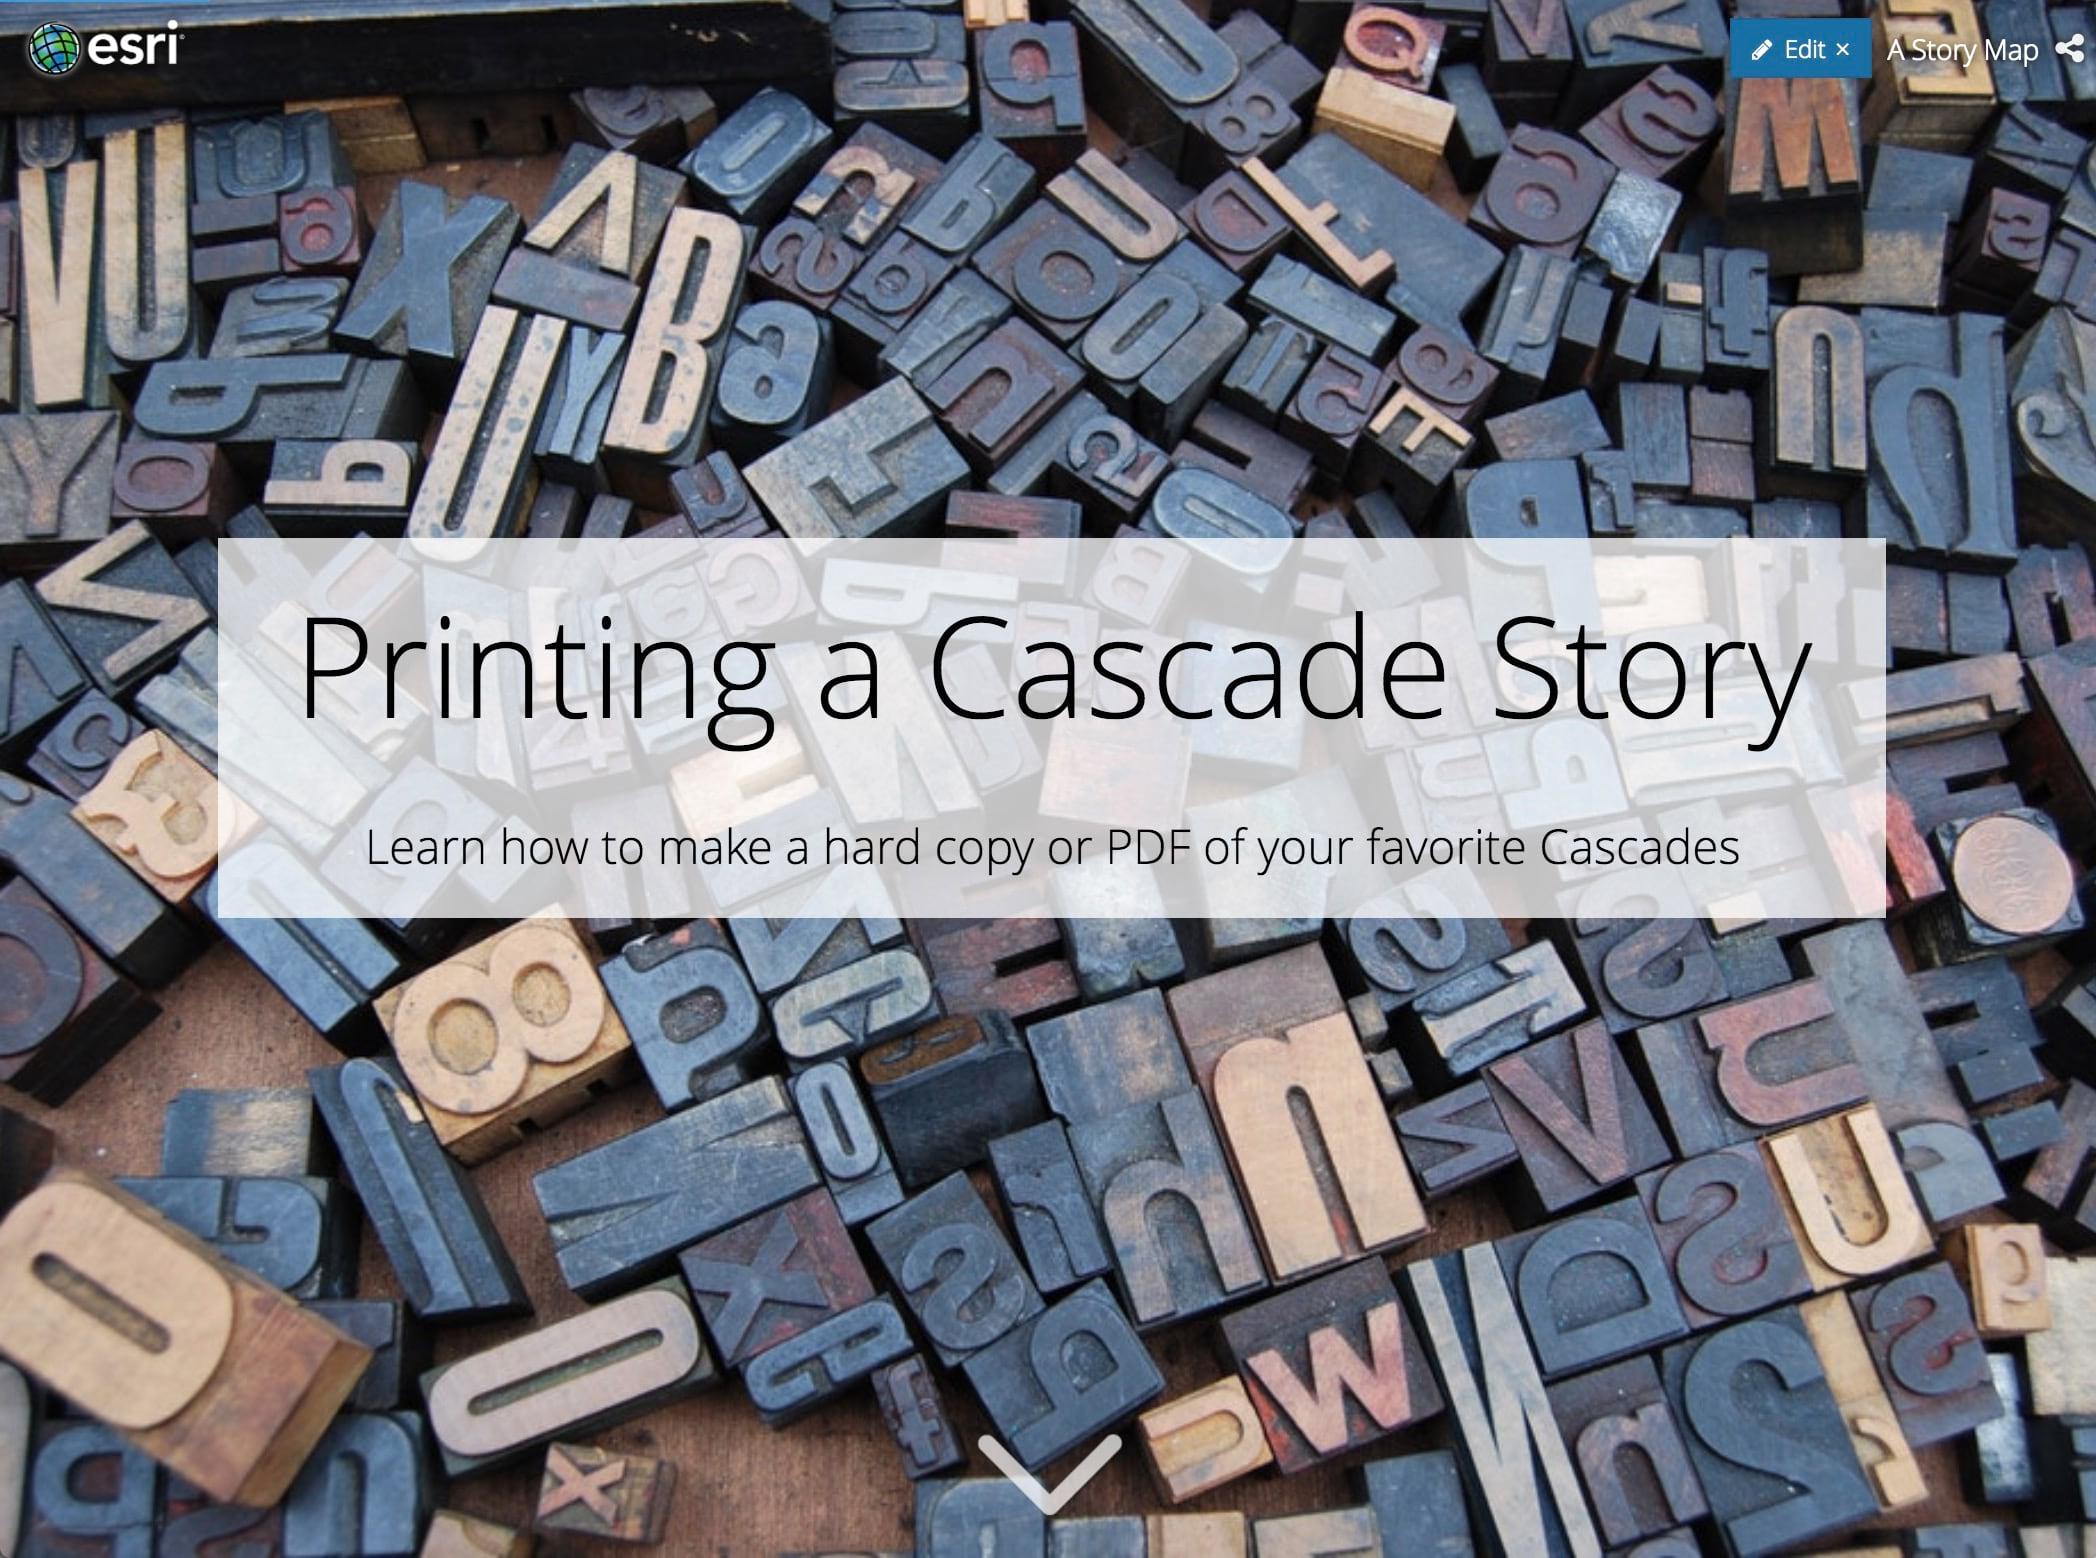 Printing a Cascade Story